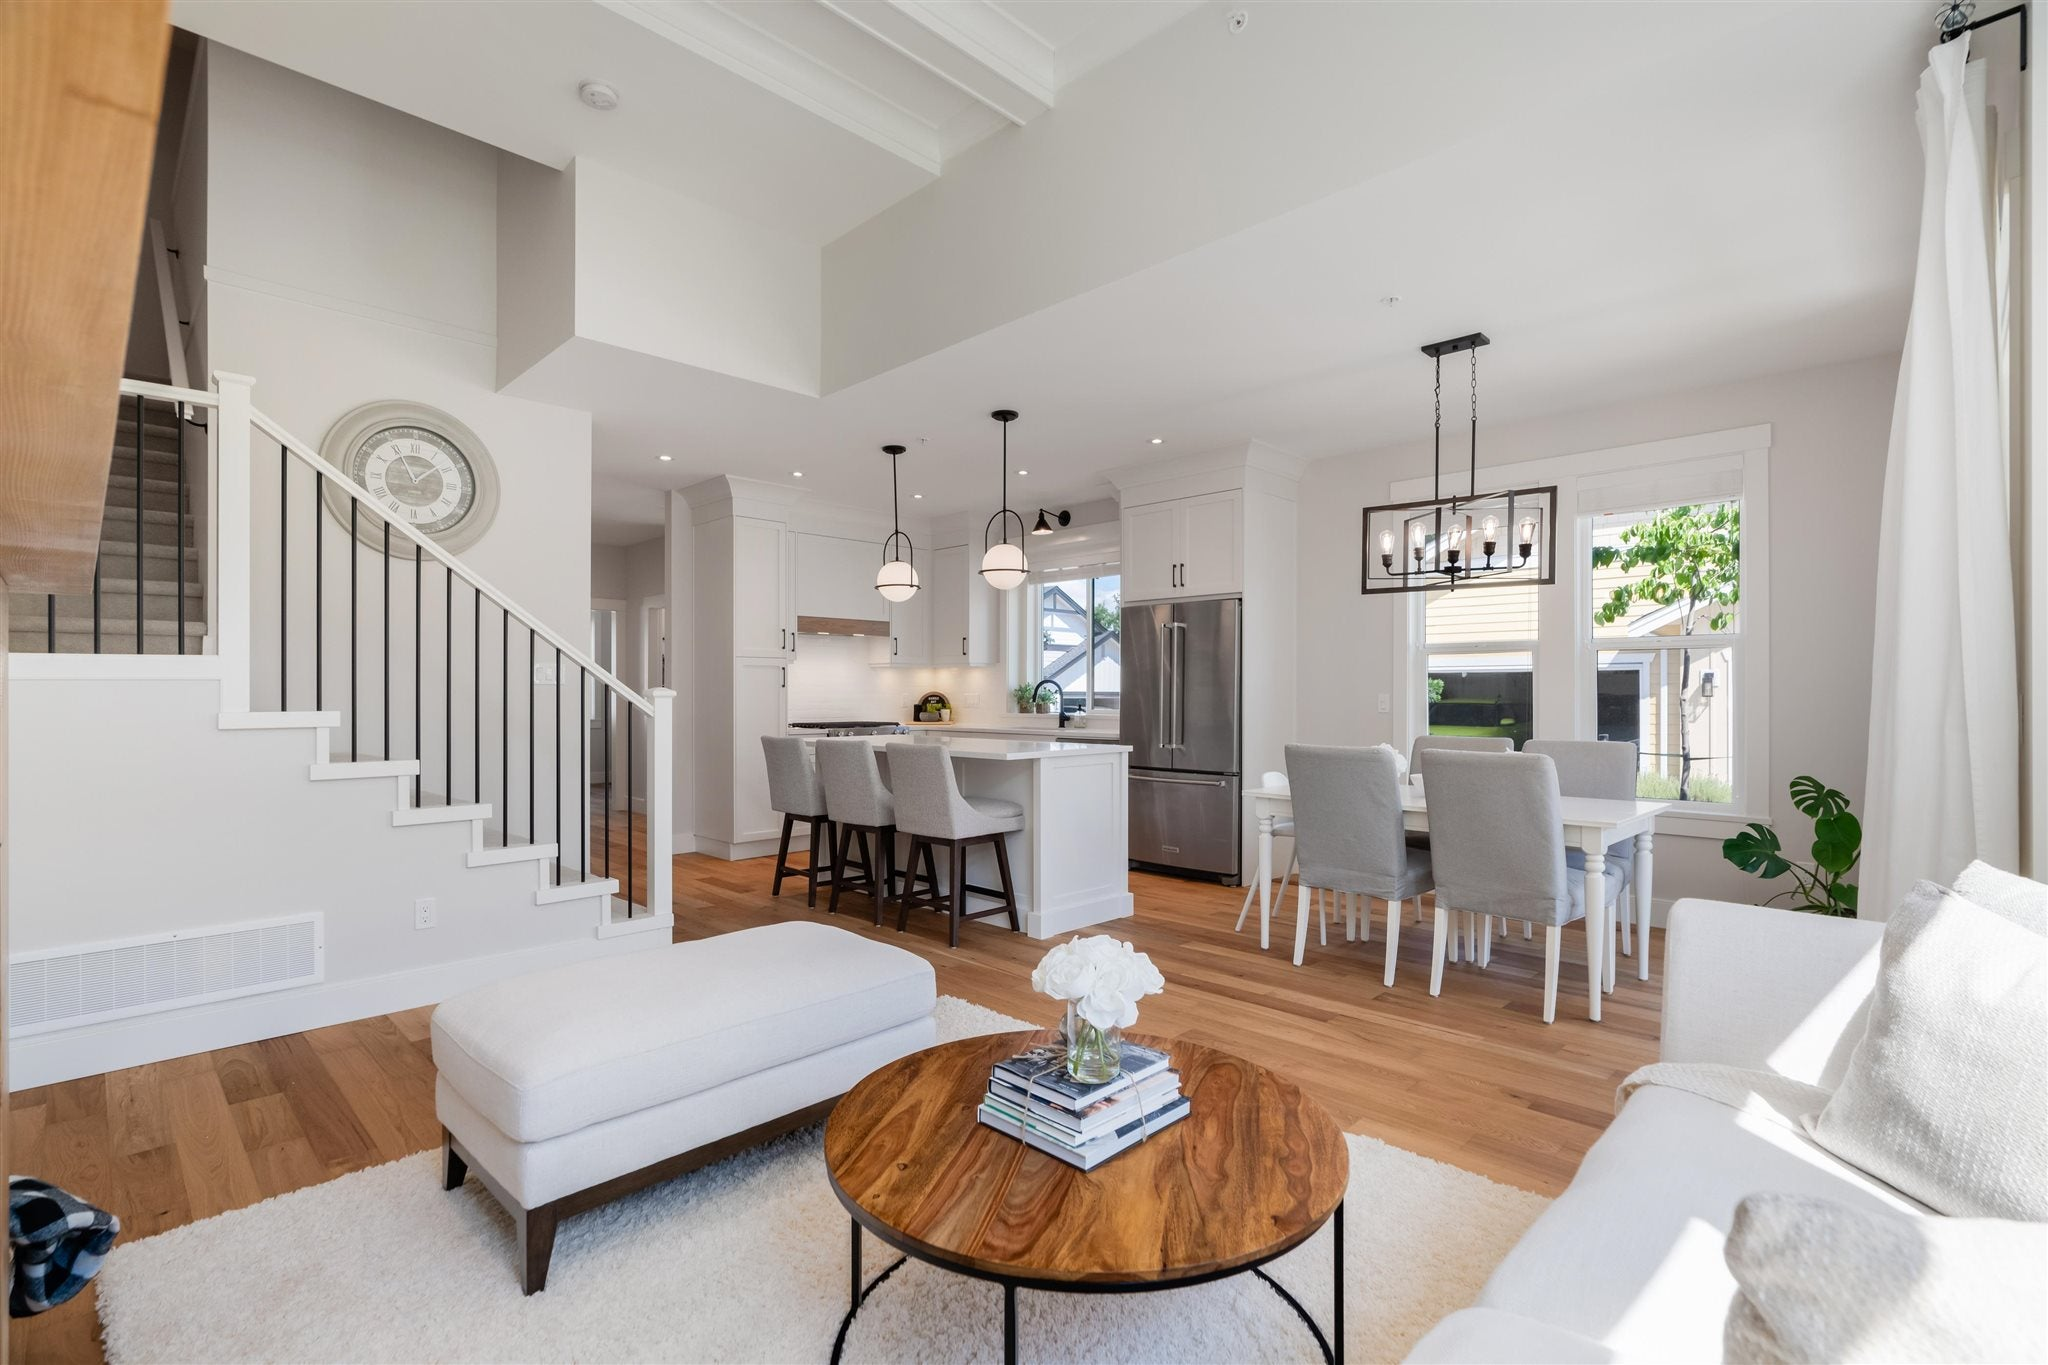 40 21858 47B AVENUE - Murrayville Townhouse for sale, 4 Bedrooms (R2603956) - #5